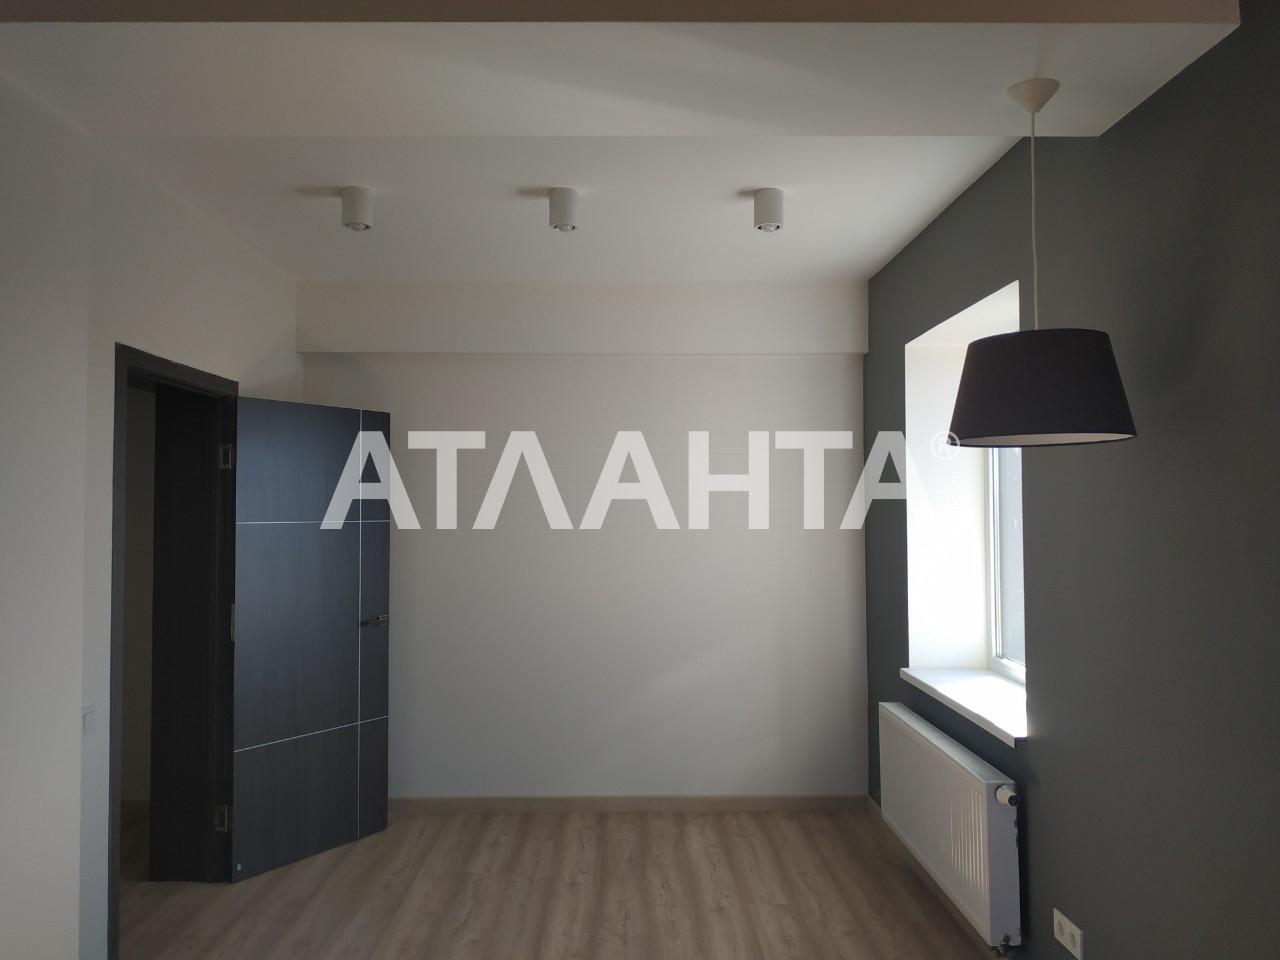 Продается 2-комнатная Квартира на ул. Малая Кольцевая — 61 000 у.е. (фото №6)